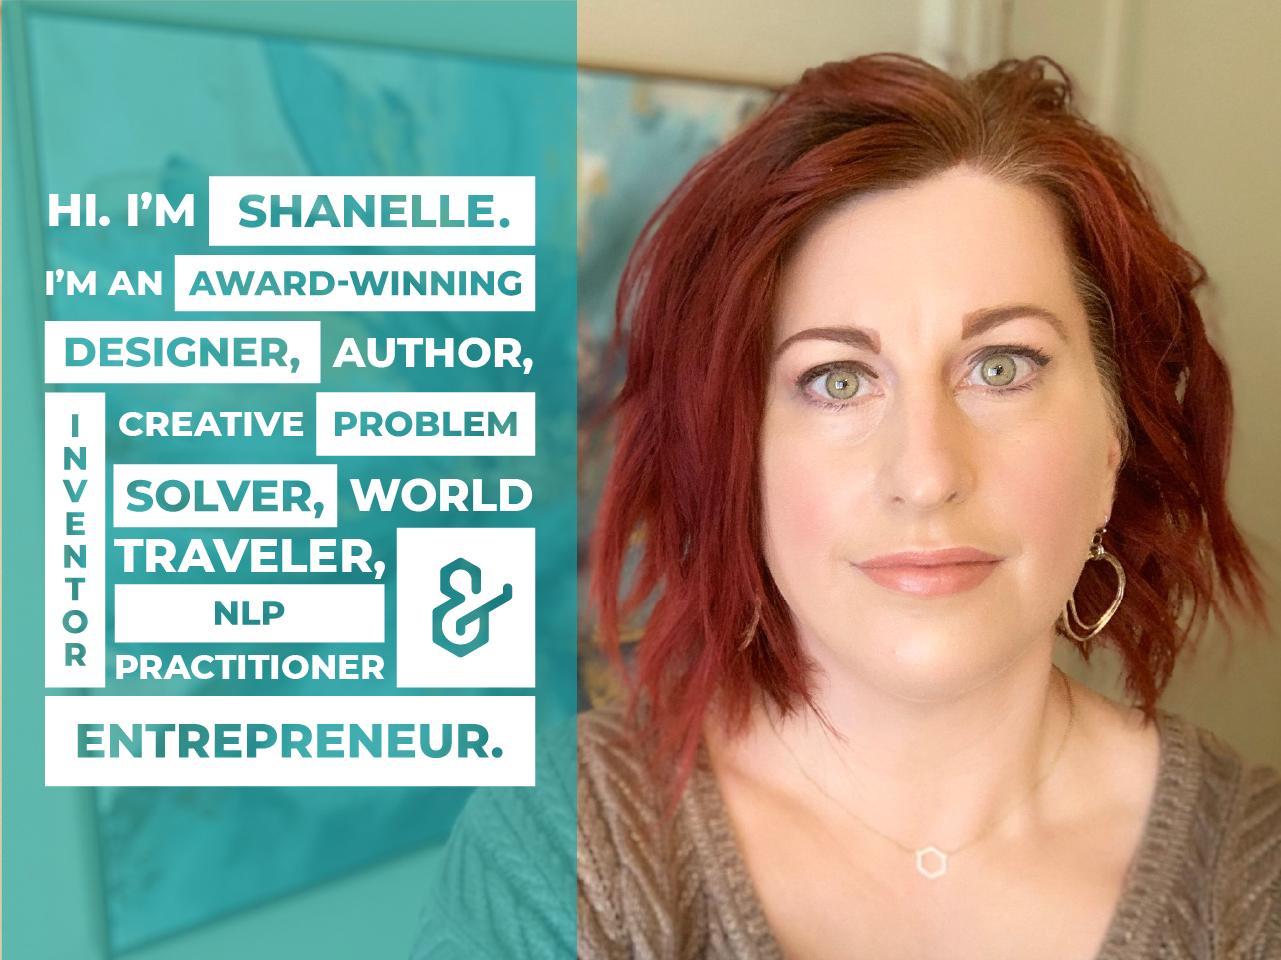 I'm Shanelle. I'm an award-winning designer, author, inventor, creative problem solver, world traveler, NLP Practitioner. and entrepreneur.